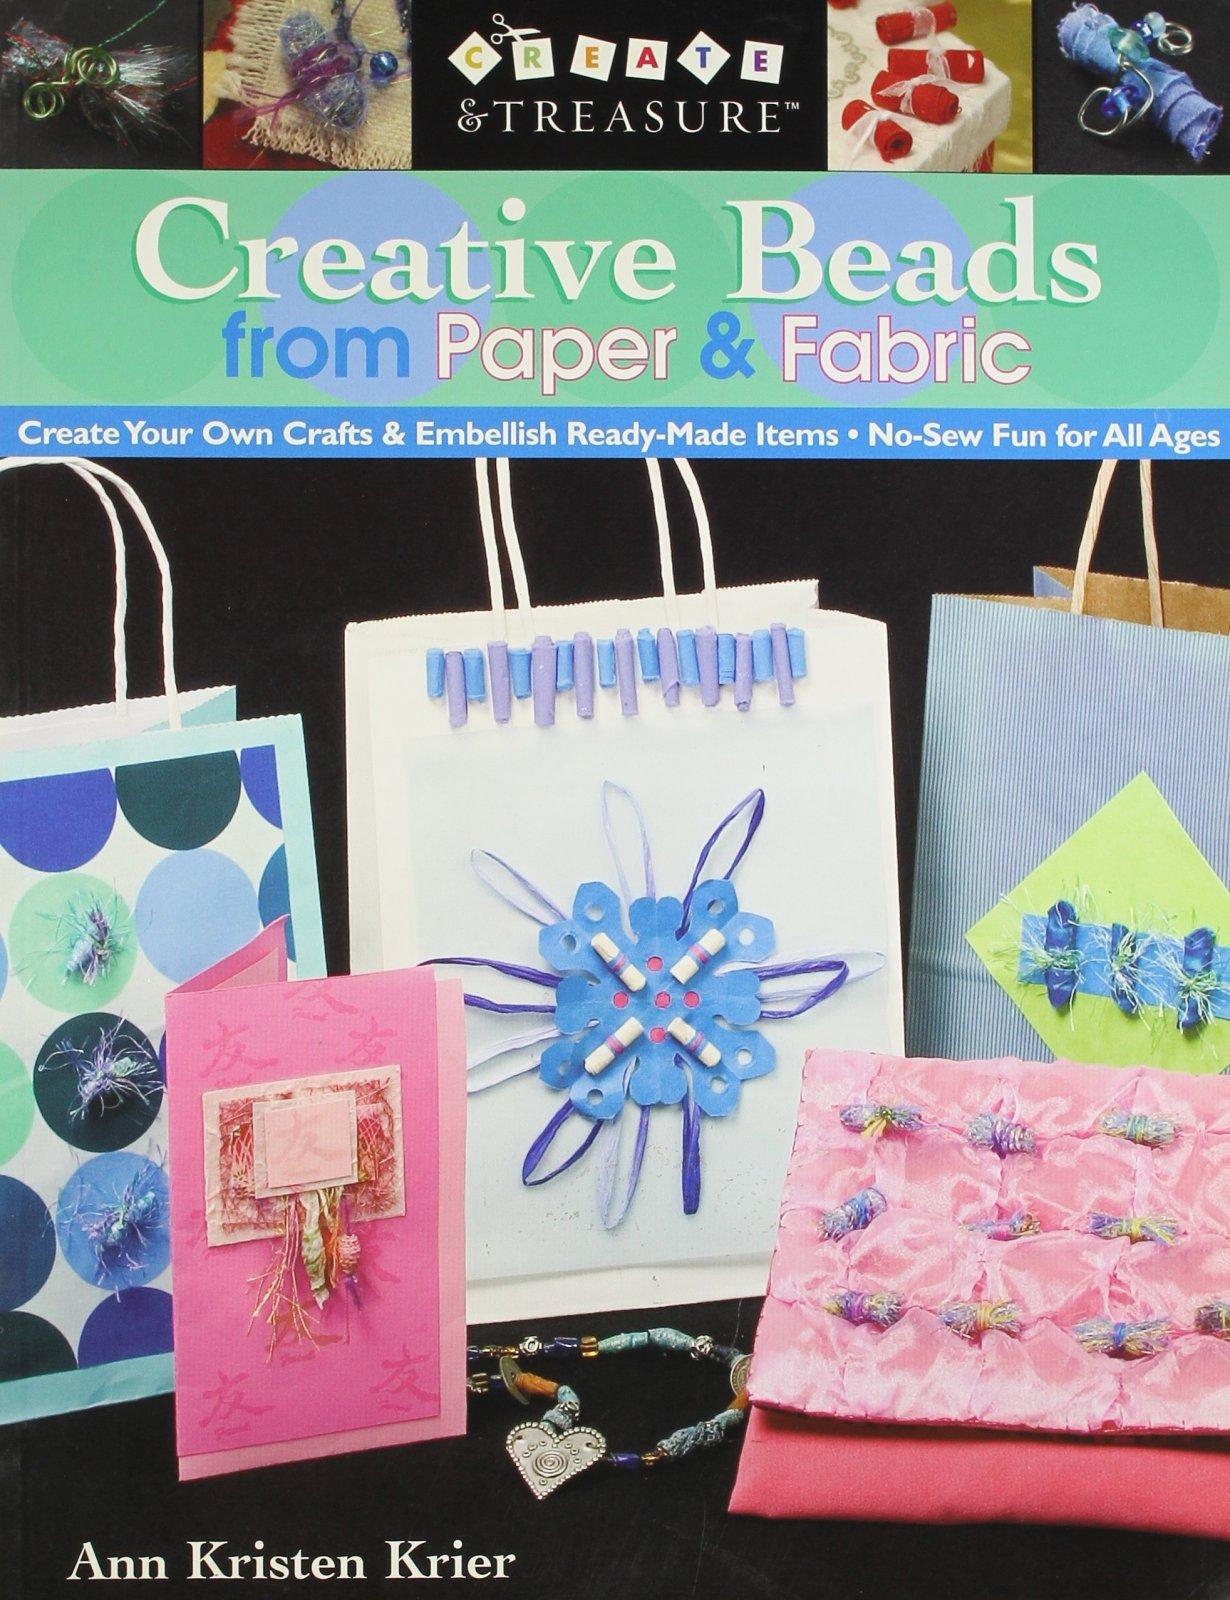 Creative Beads from Paper & Fabric - by Ann Kristen Krier